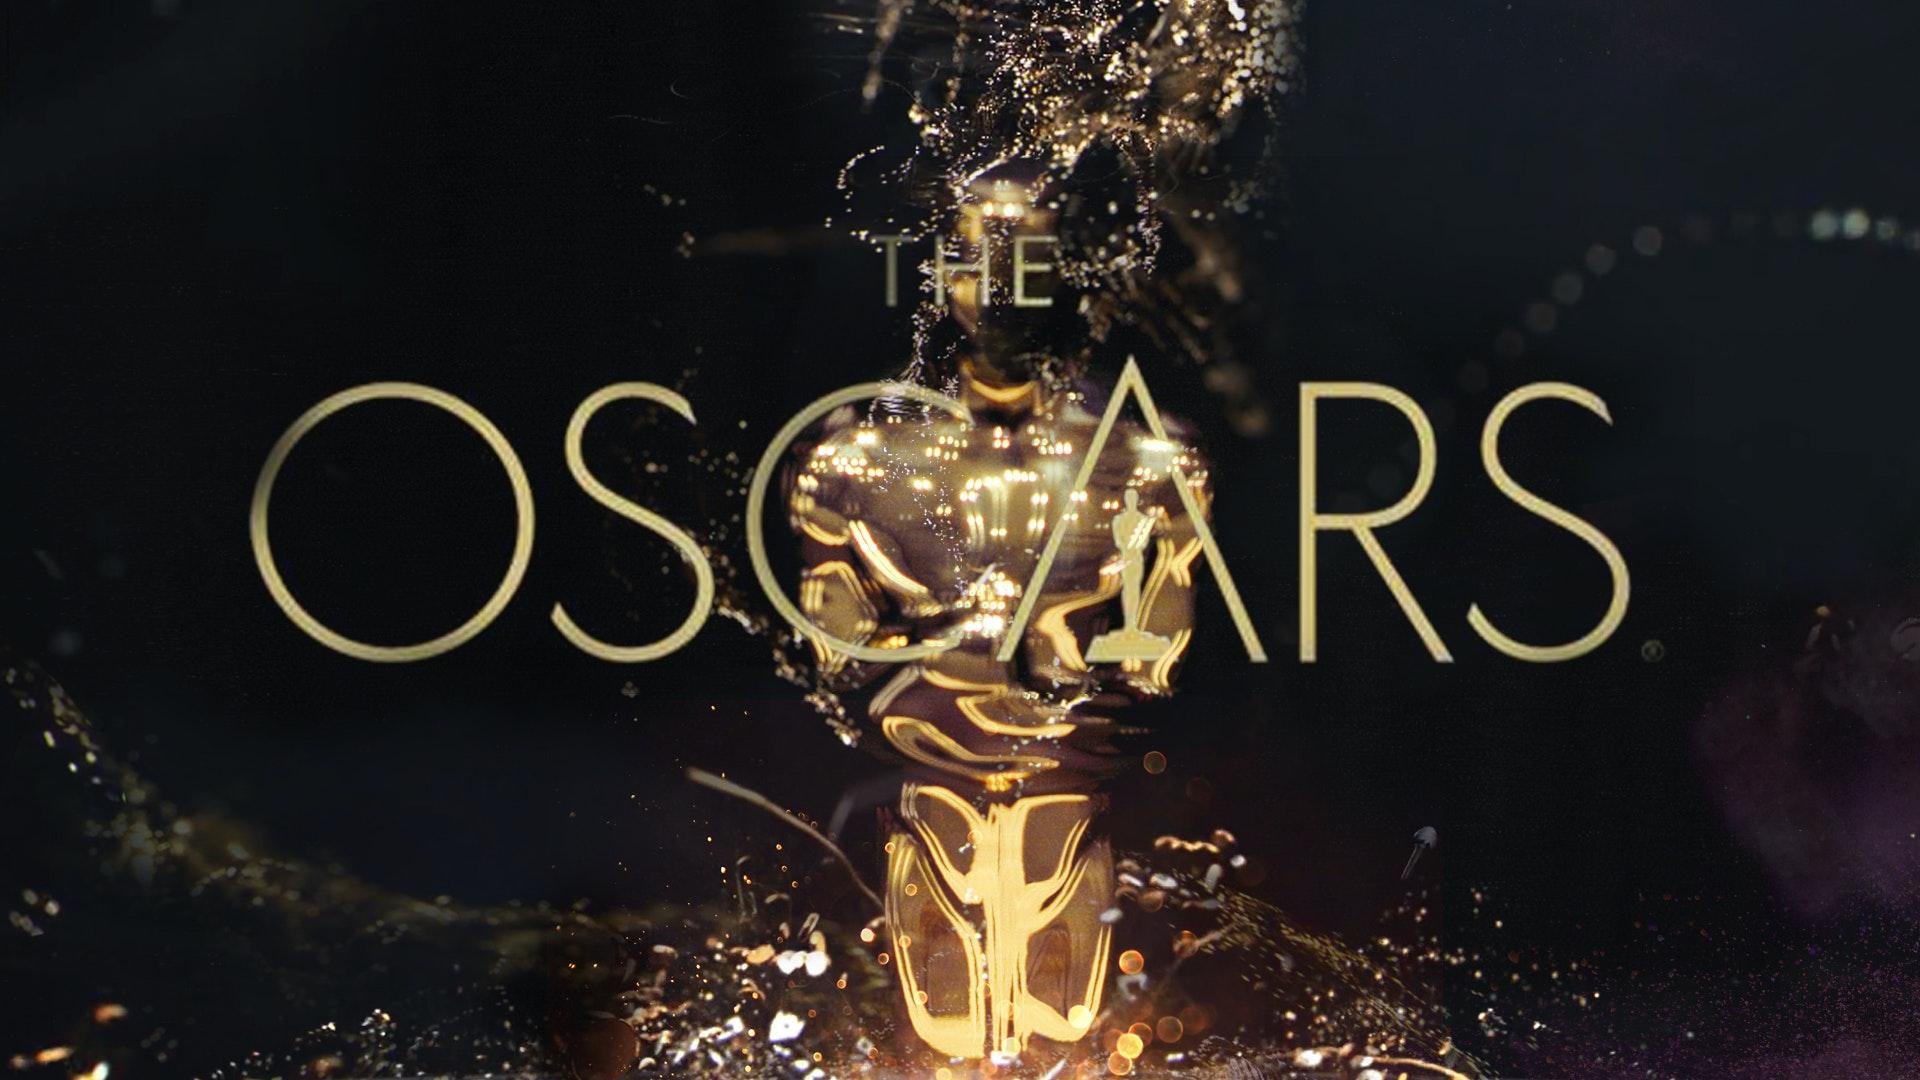 Oscars_MainTitle_RachelBrickel_F08